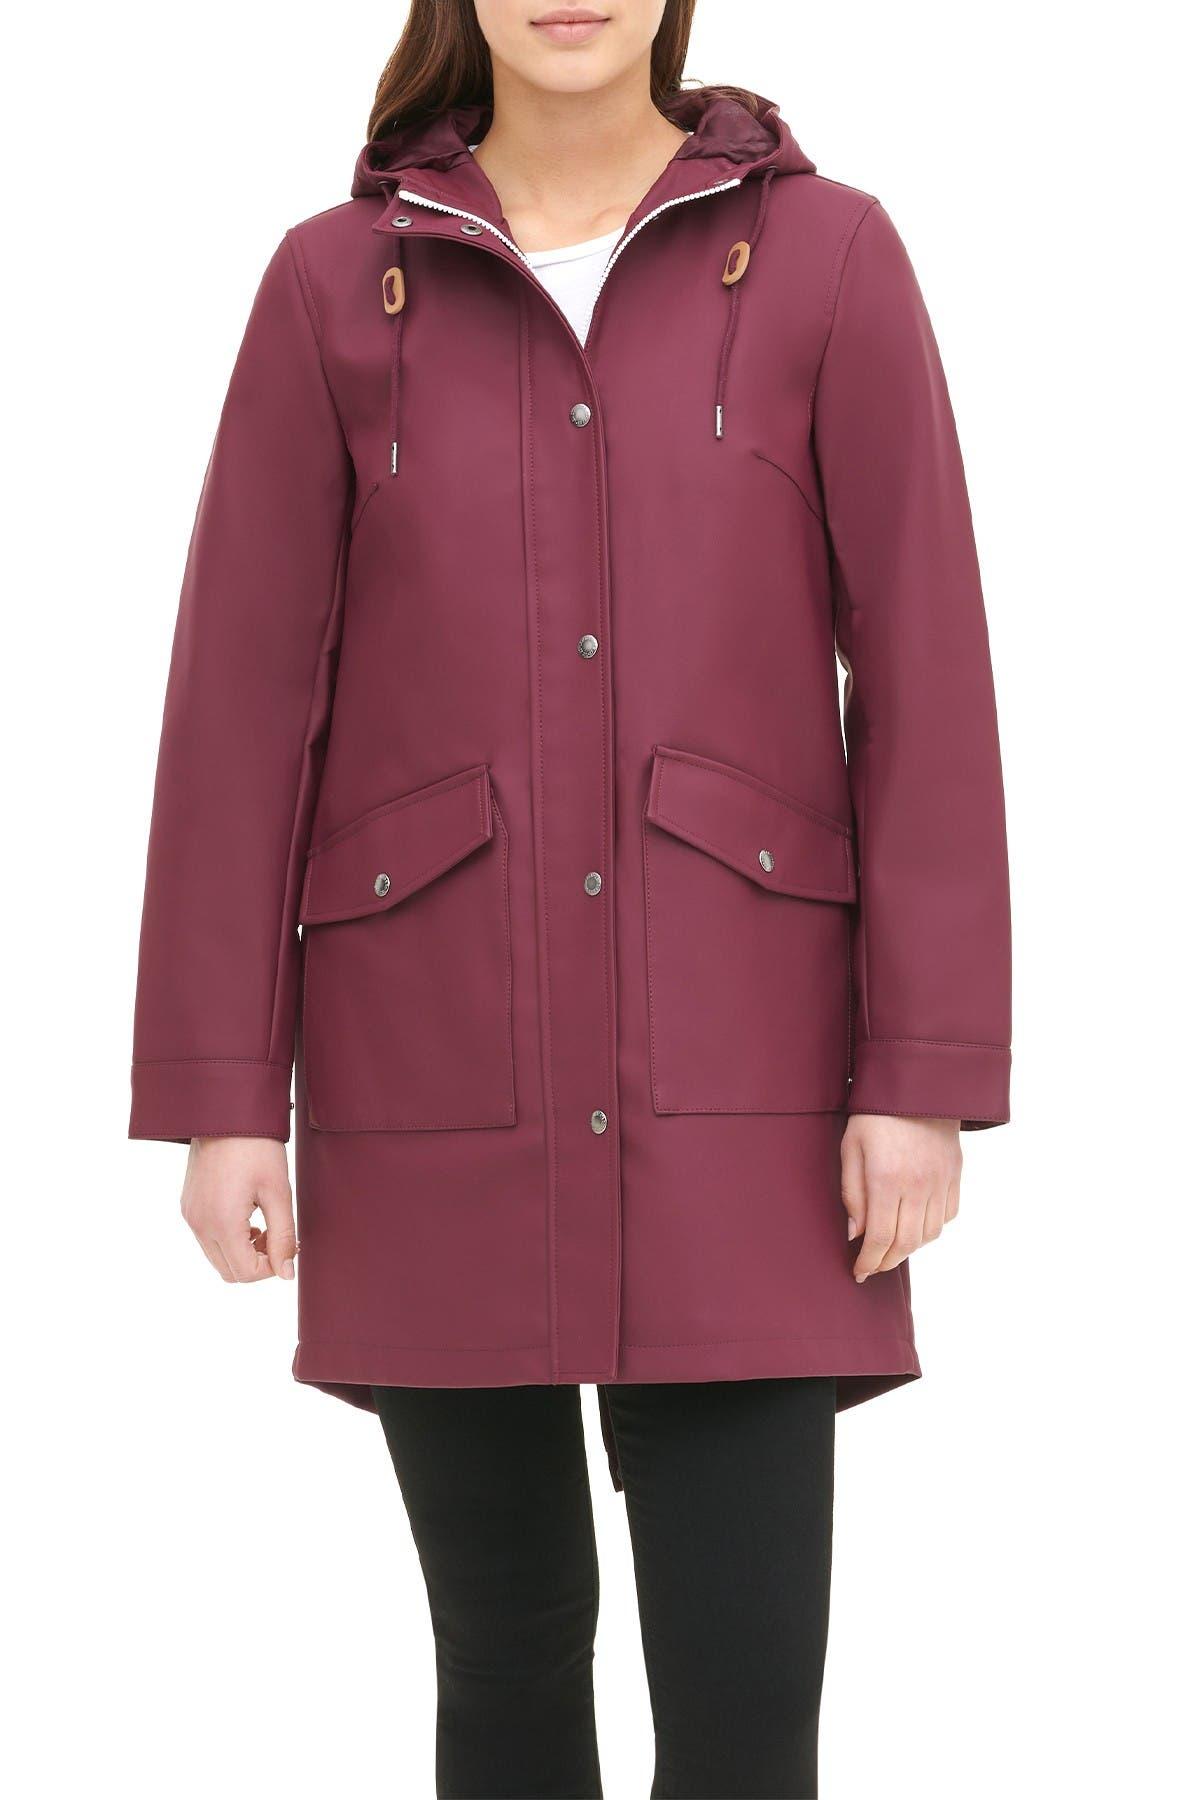 Image of Levi's Water Repellent Lightweight Hooded Raincoat